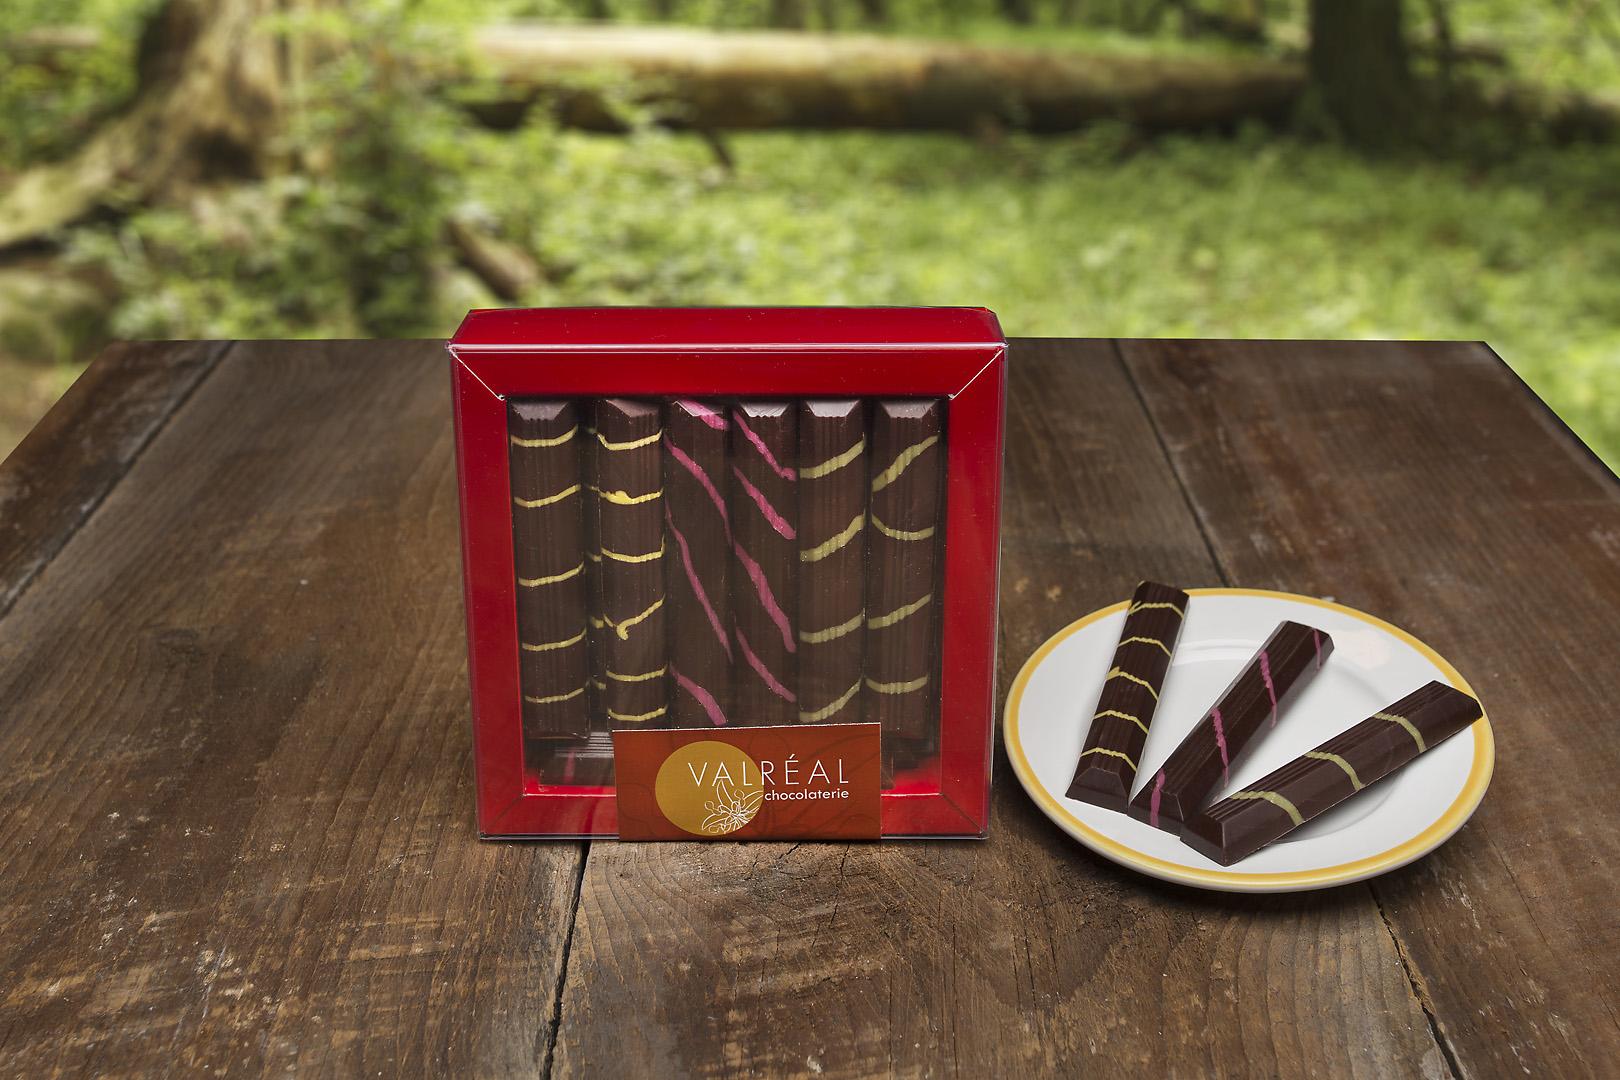 photographe-chocolat-produit-the-valreal